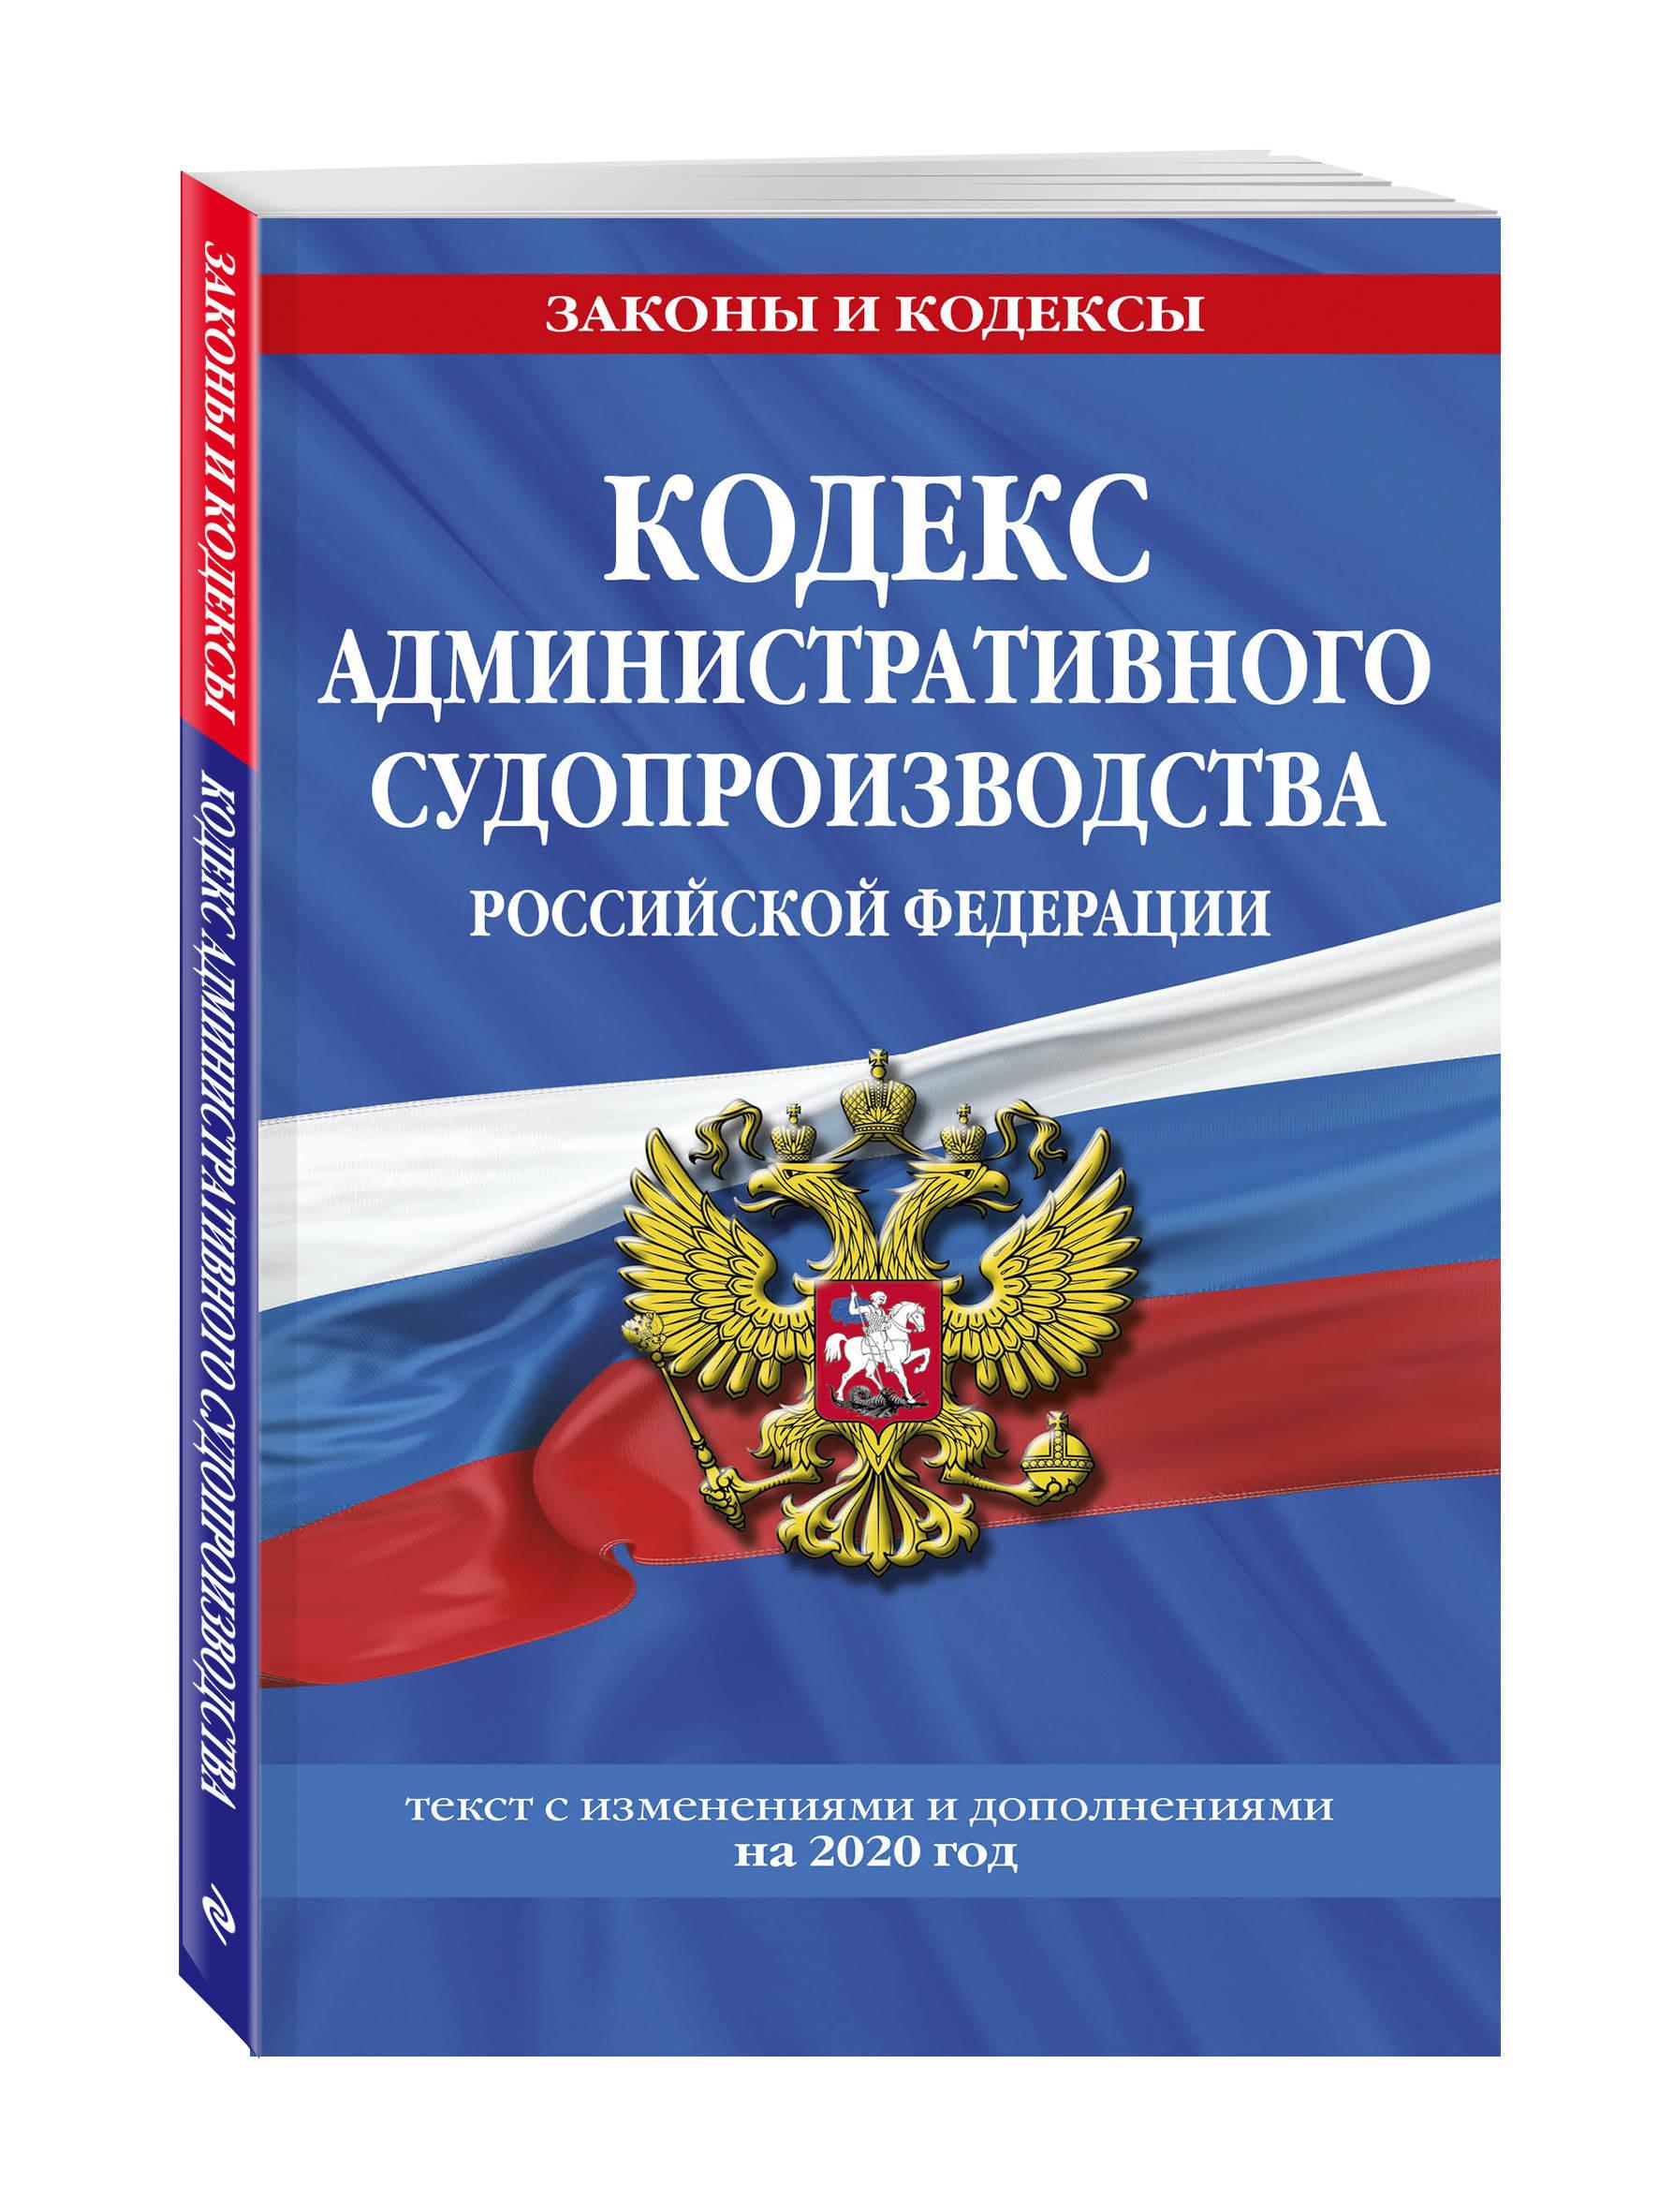 Кодекс административного судопроизводства РФ: текст с изм. и доп. на 2020 год